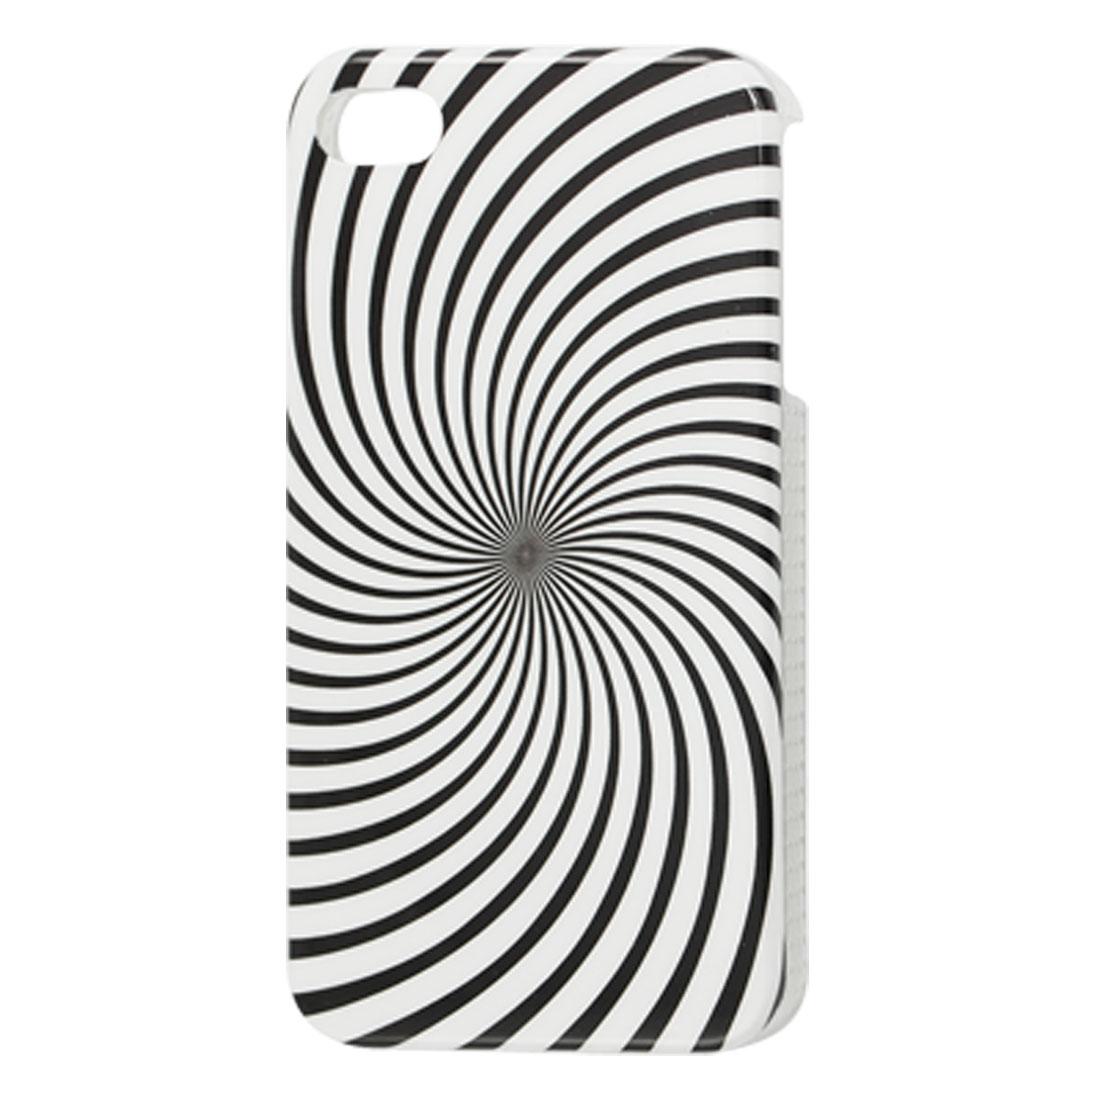 Black White IMD Spiral Print Plastic Back Cover for iPhone 4 4G 4S